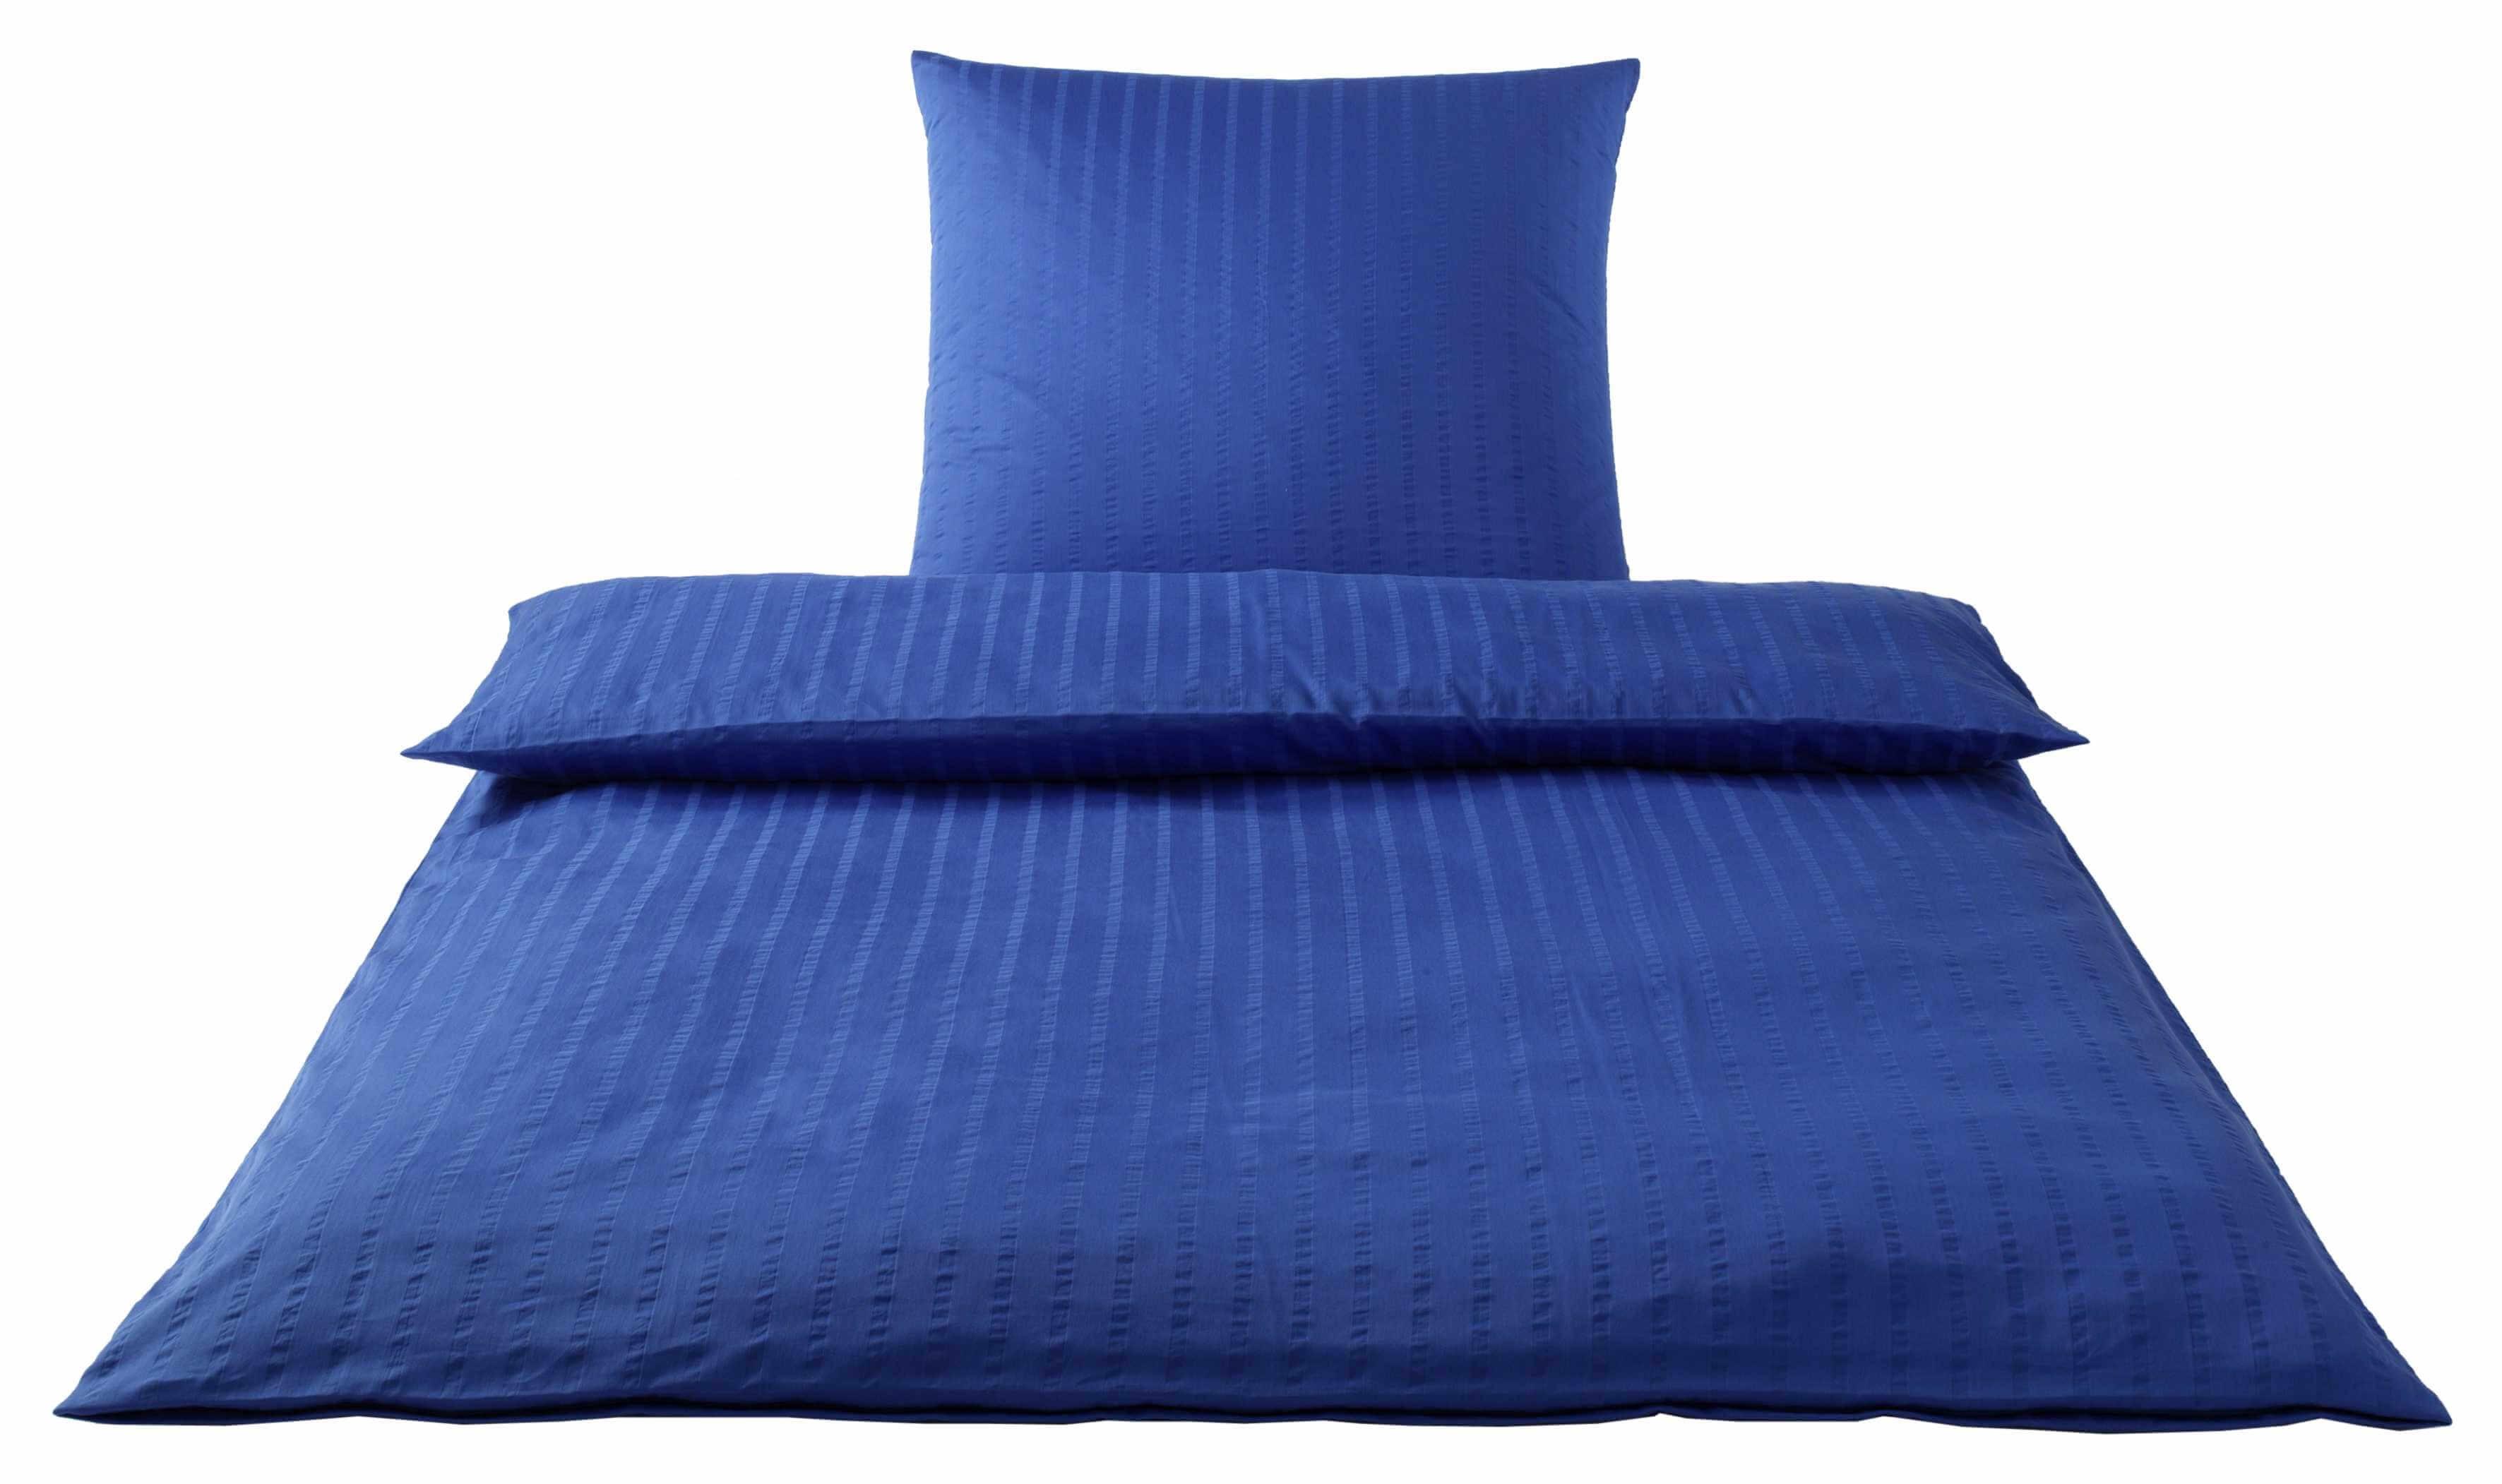 bettw sche elegante chelsea 7013 saphir blau. Black Bedroom Furniture Sets. Home Design Ideas